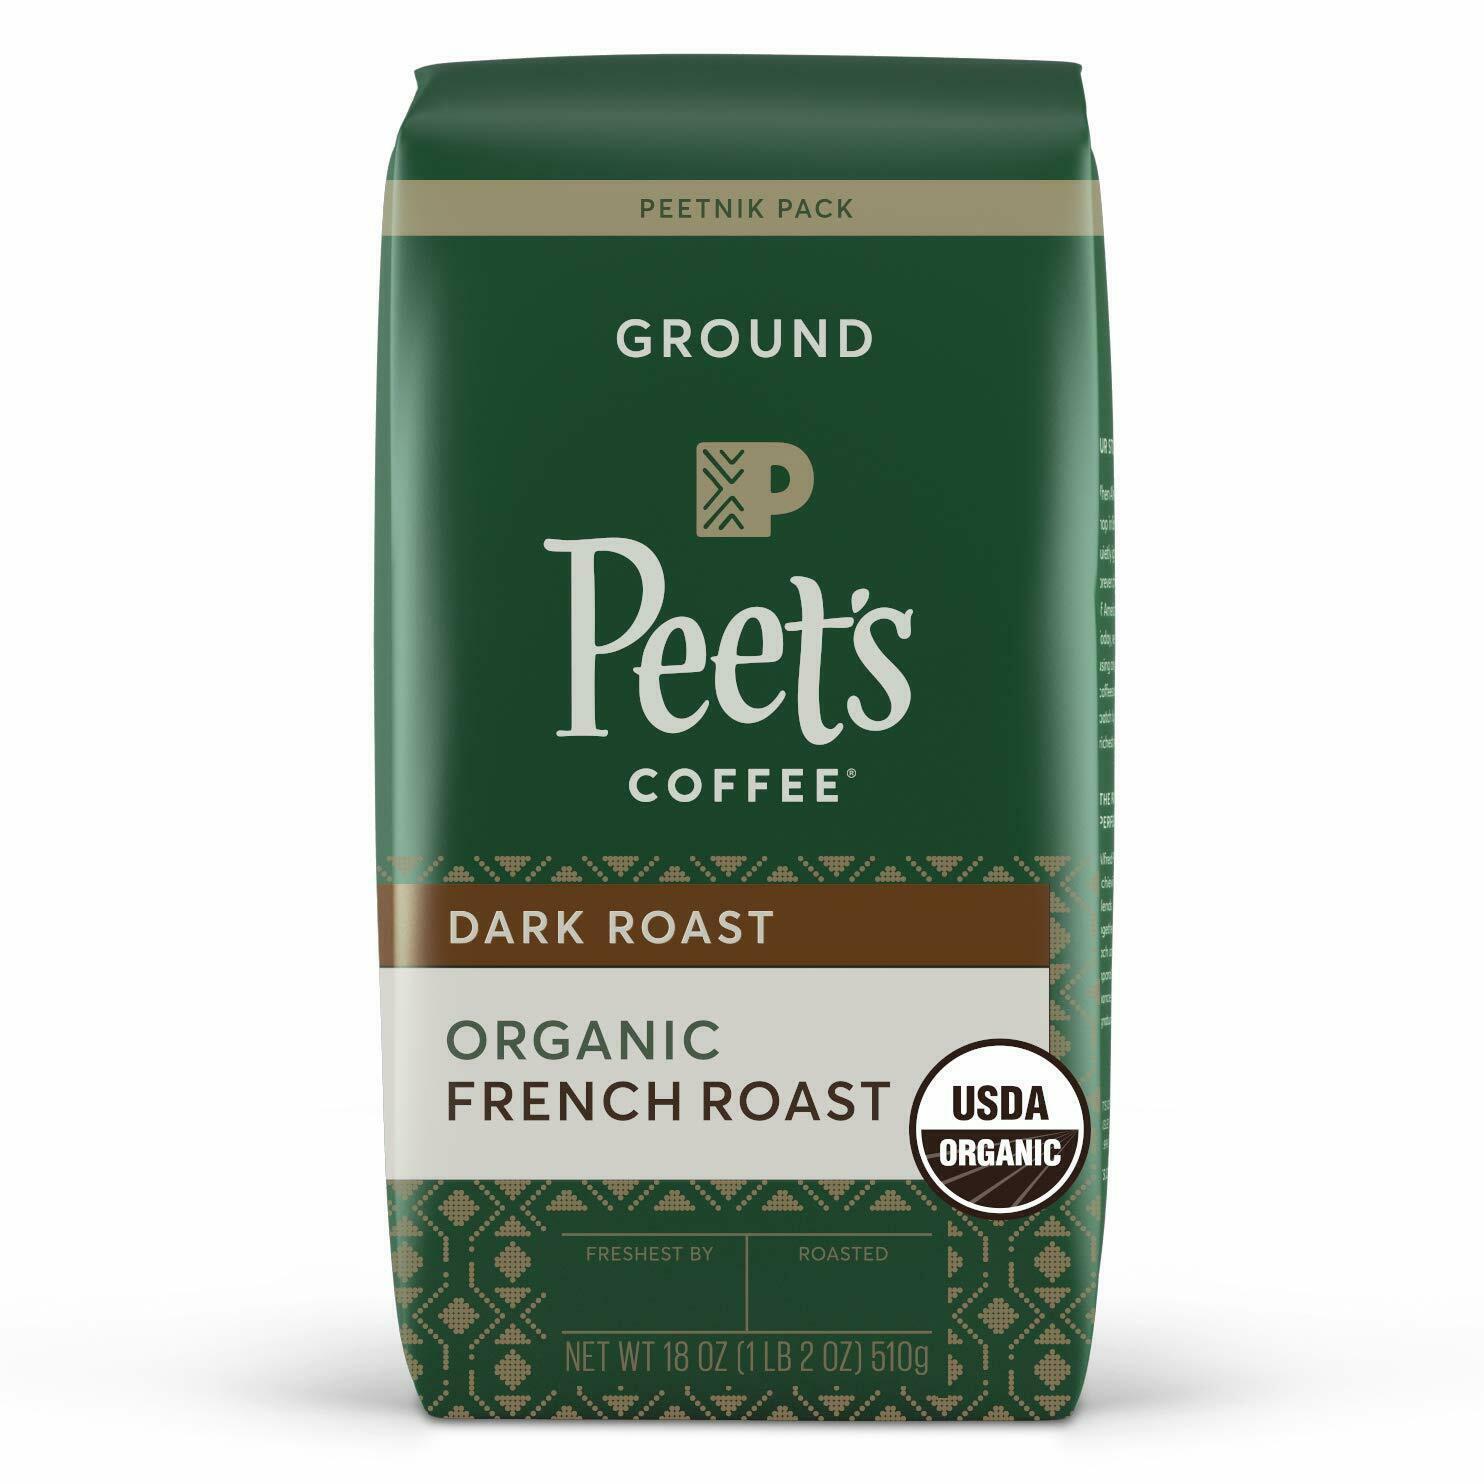 PEET'S COFFEE ORGANIC FRENCH ROAST DARK ROAST GROUND 18OZ - $16.67